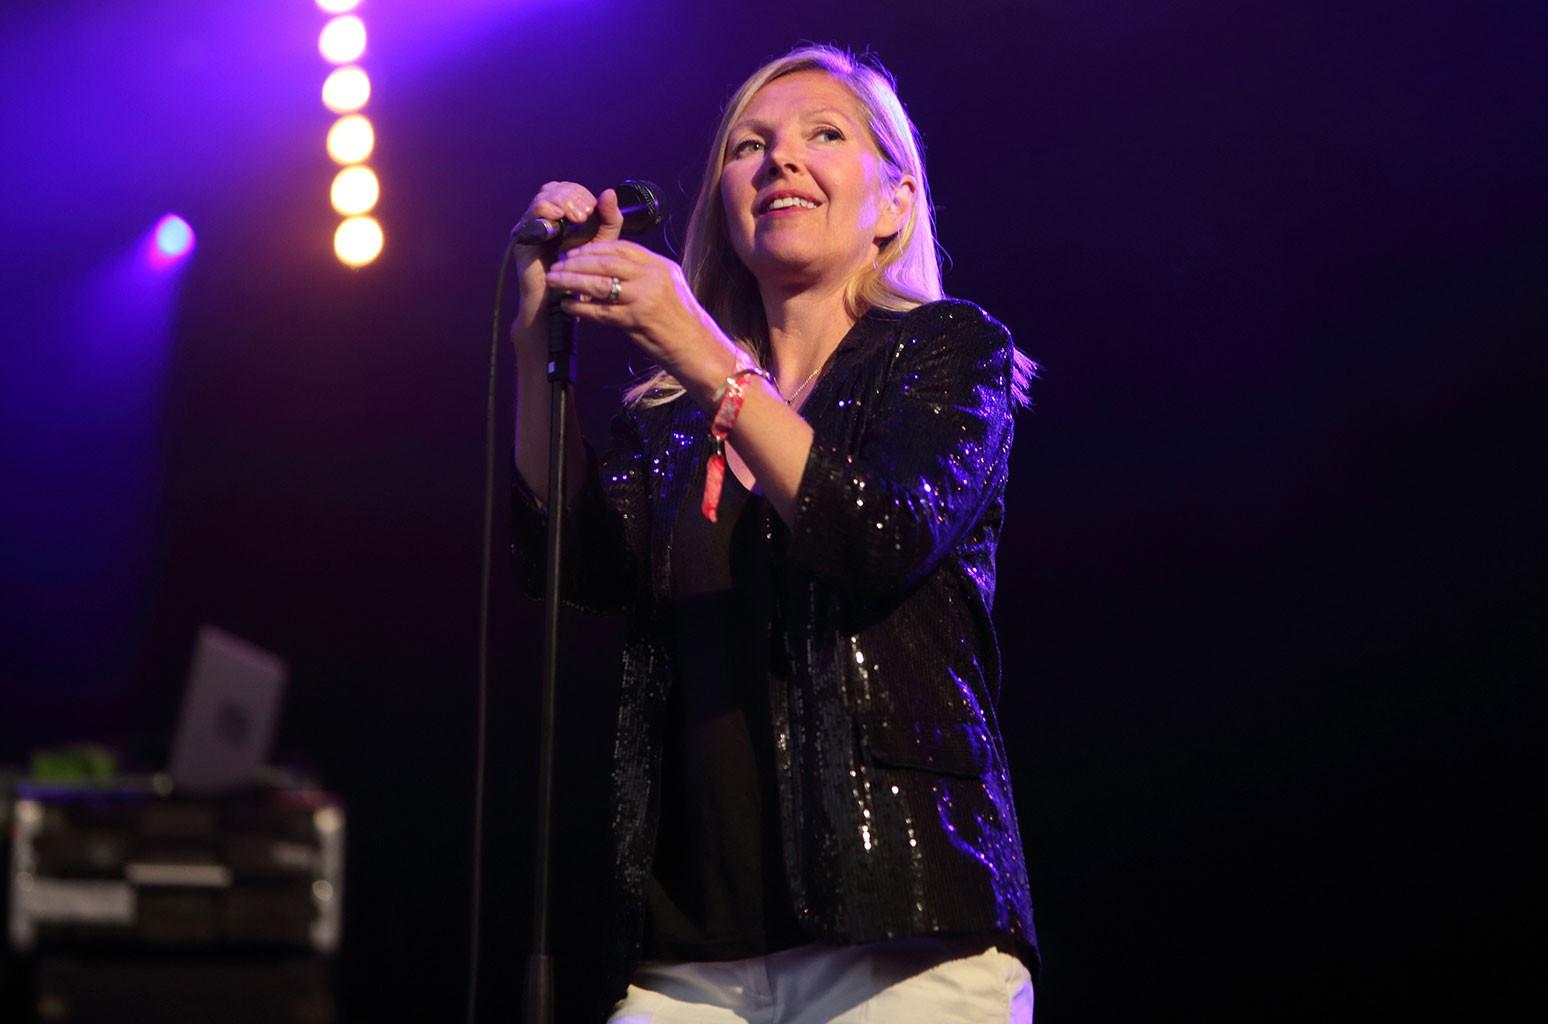 Sarah Cracknell of Saint Etienne performs on day 2 of End of the Road Festival at Larmer Tree Gardens on Sept. 5, 2015 in Farnham, Dorset.